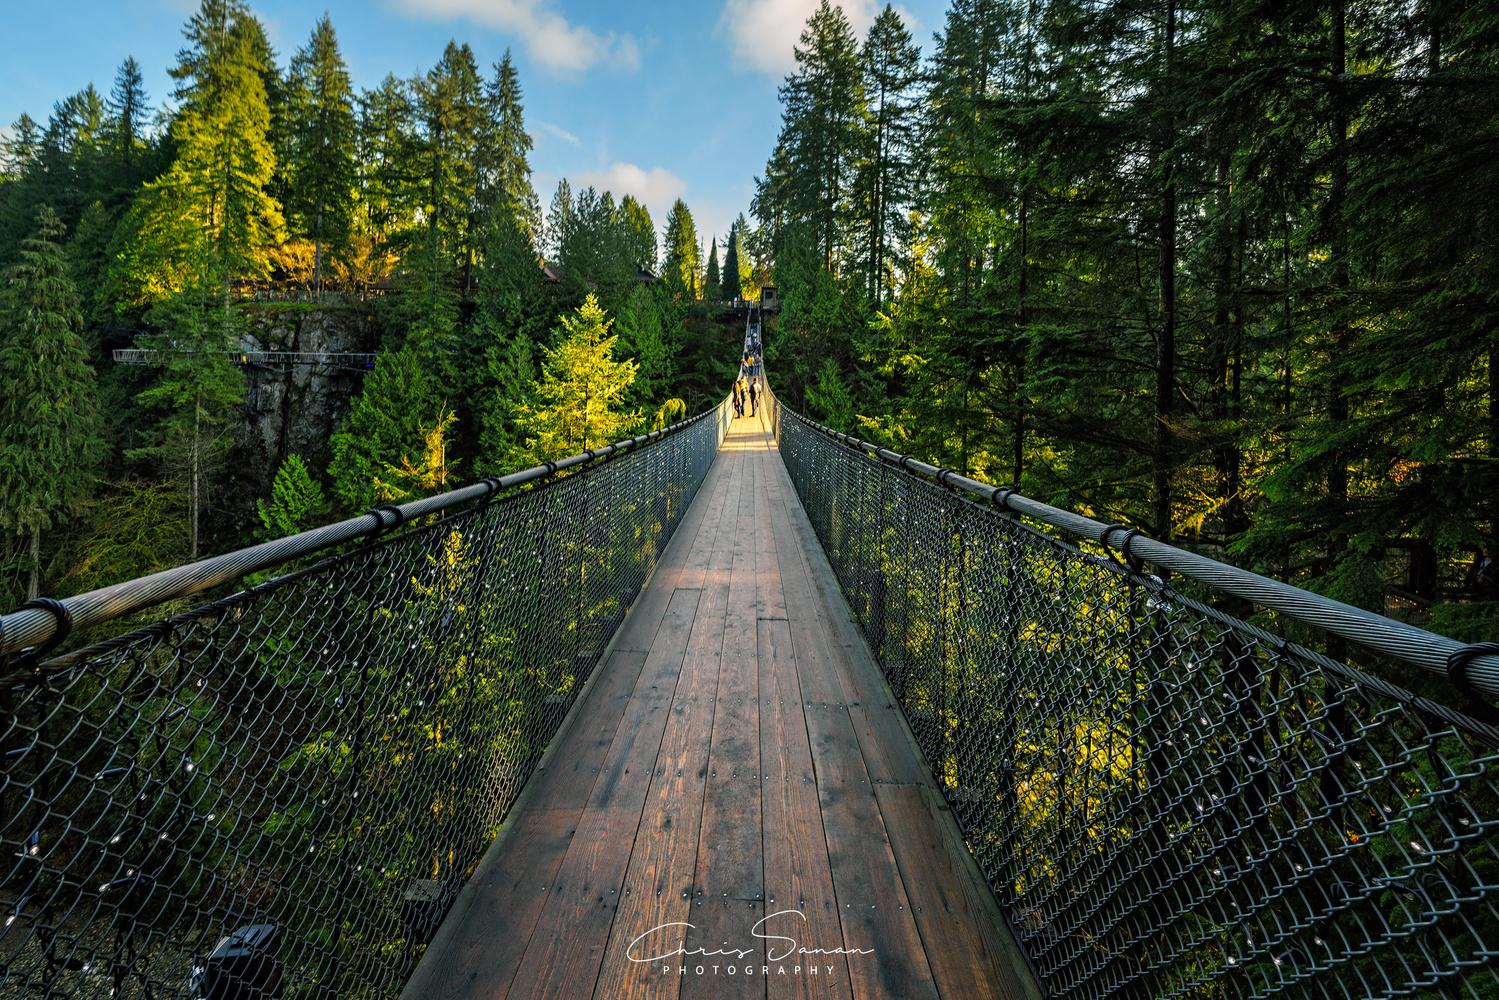 The Suspension Bridge of Capilano by Chris Sanan